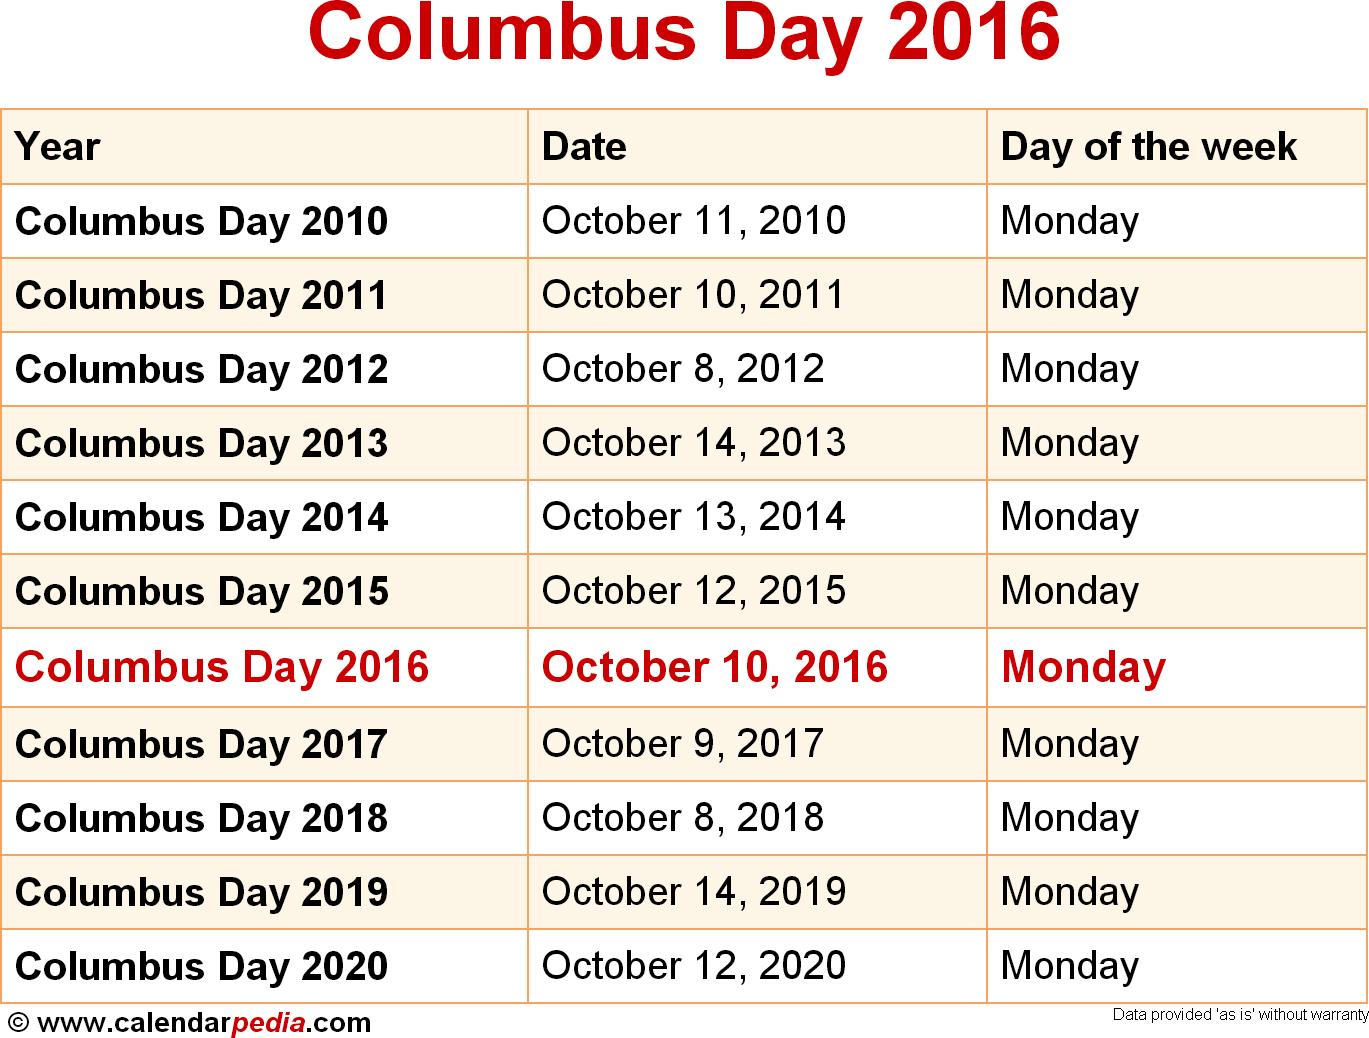 Date 355 Days Ago